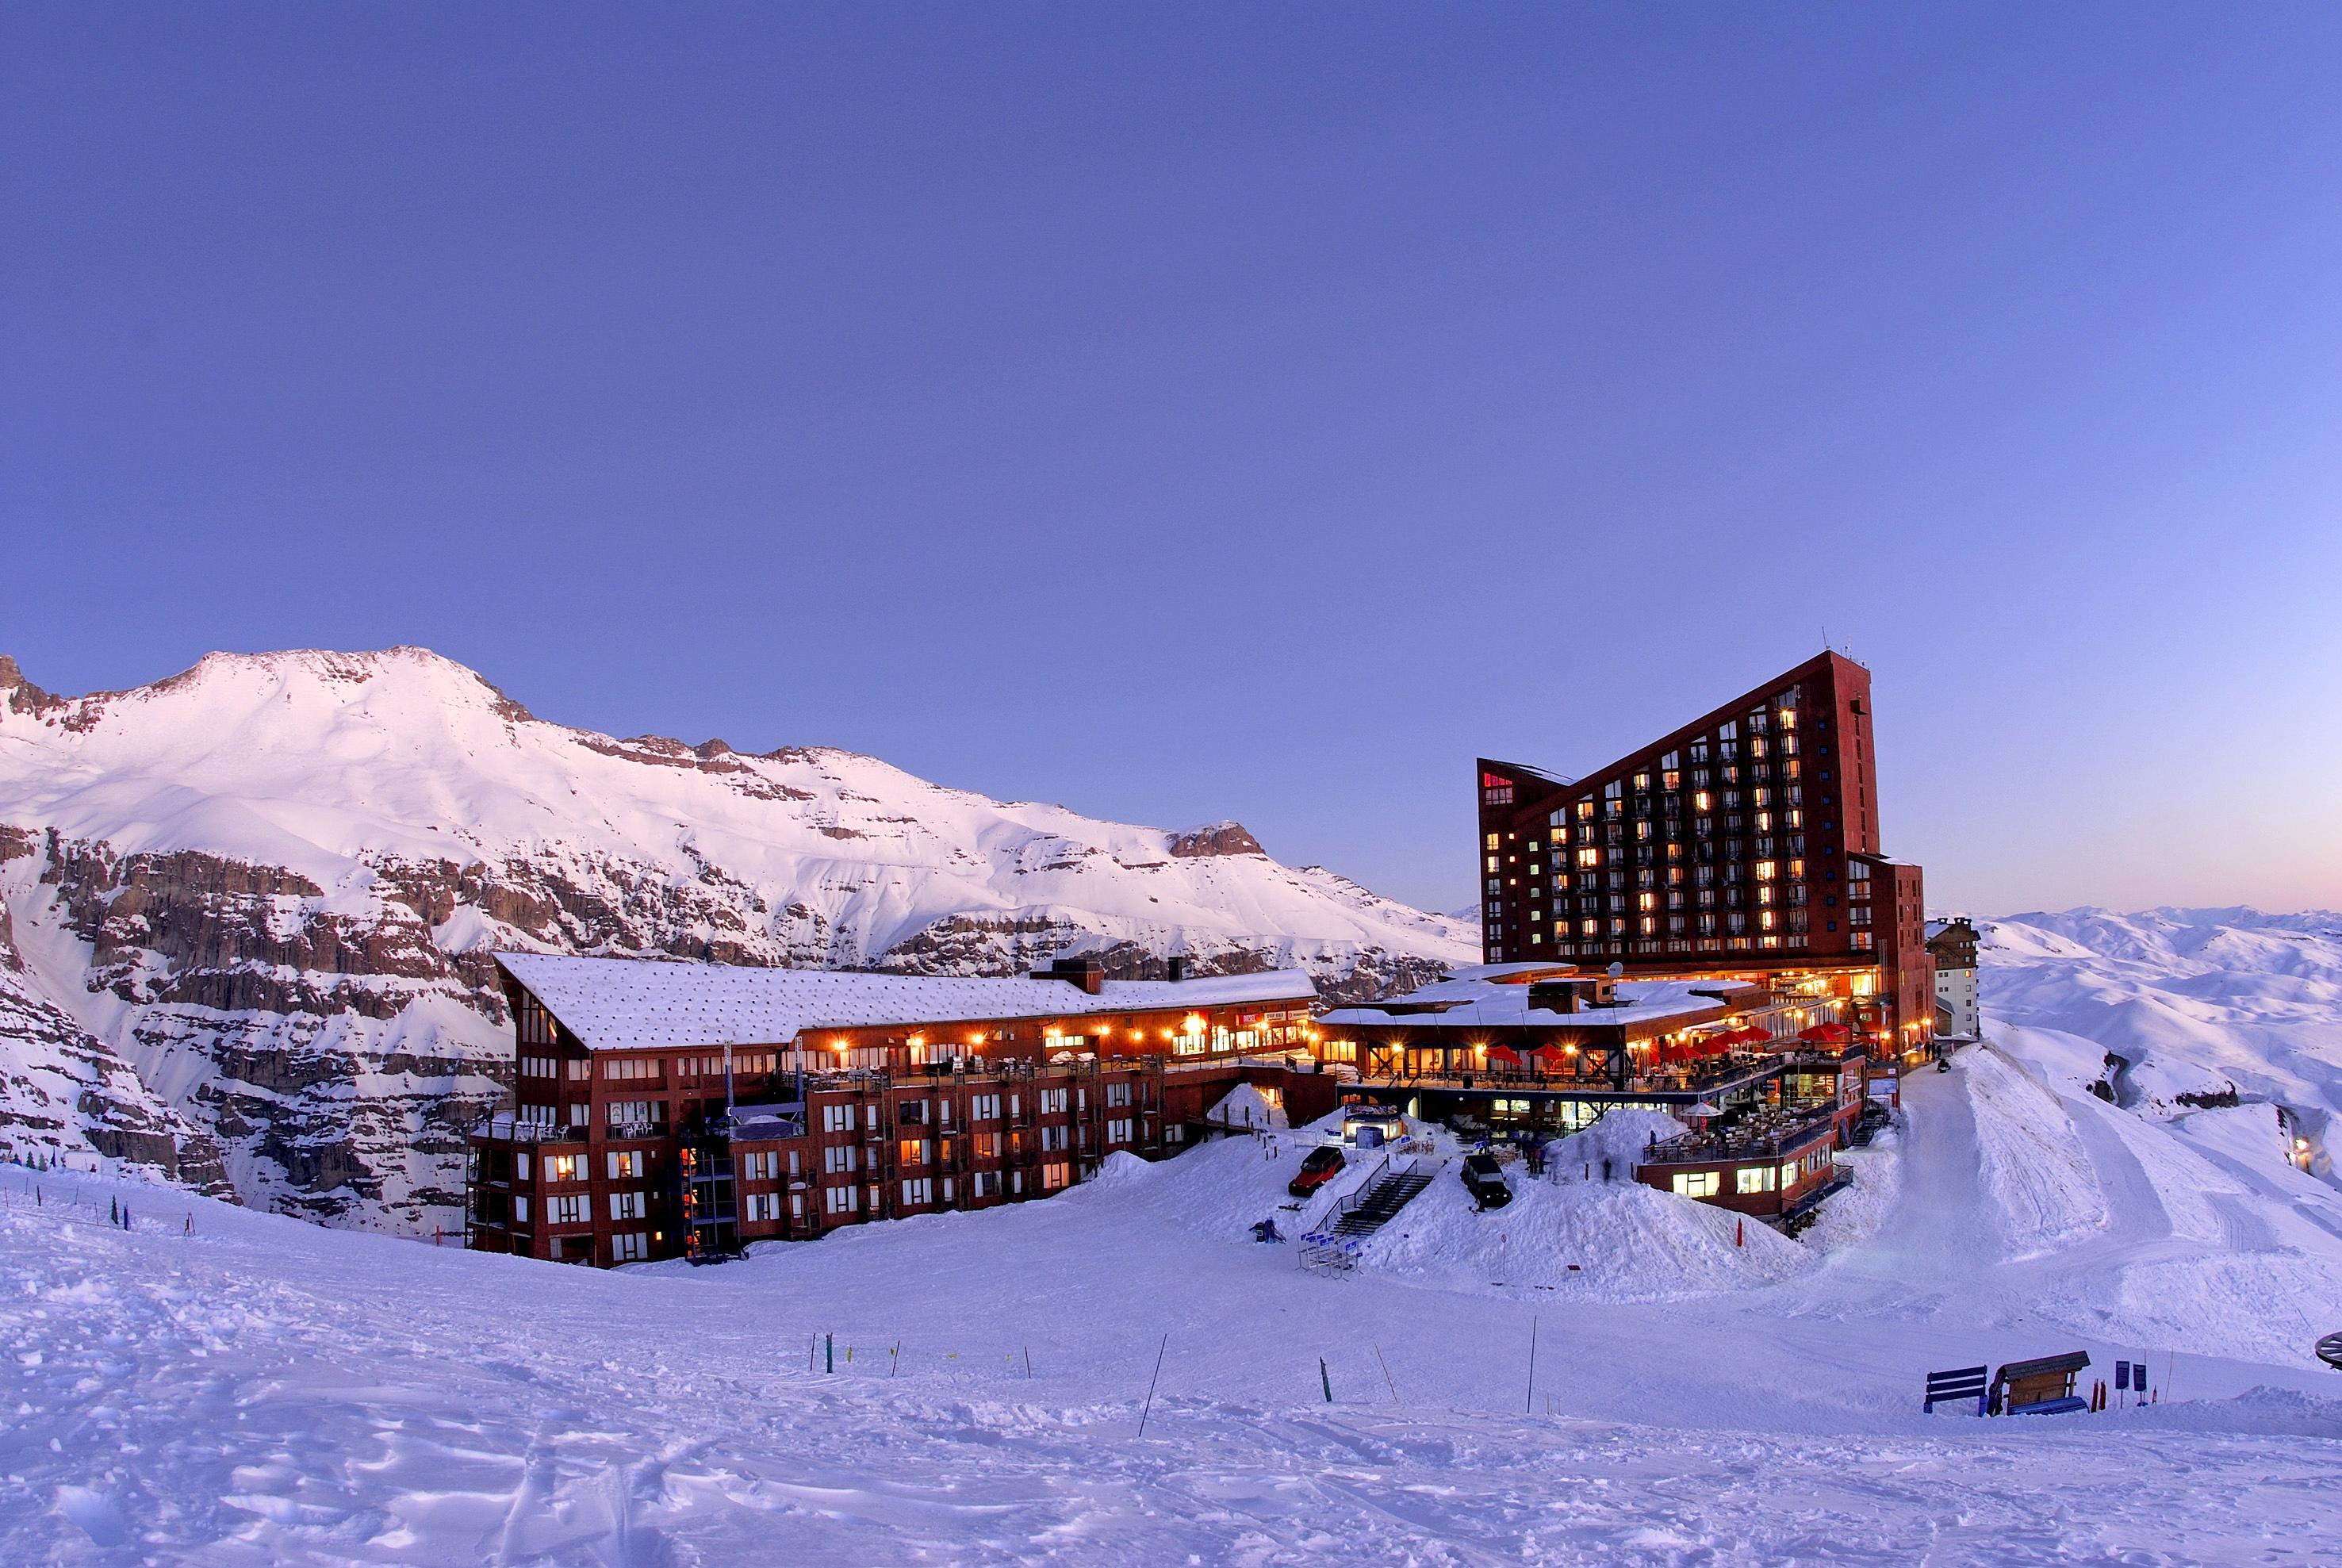 valle nevado - ski club of great britain